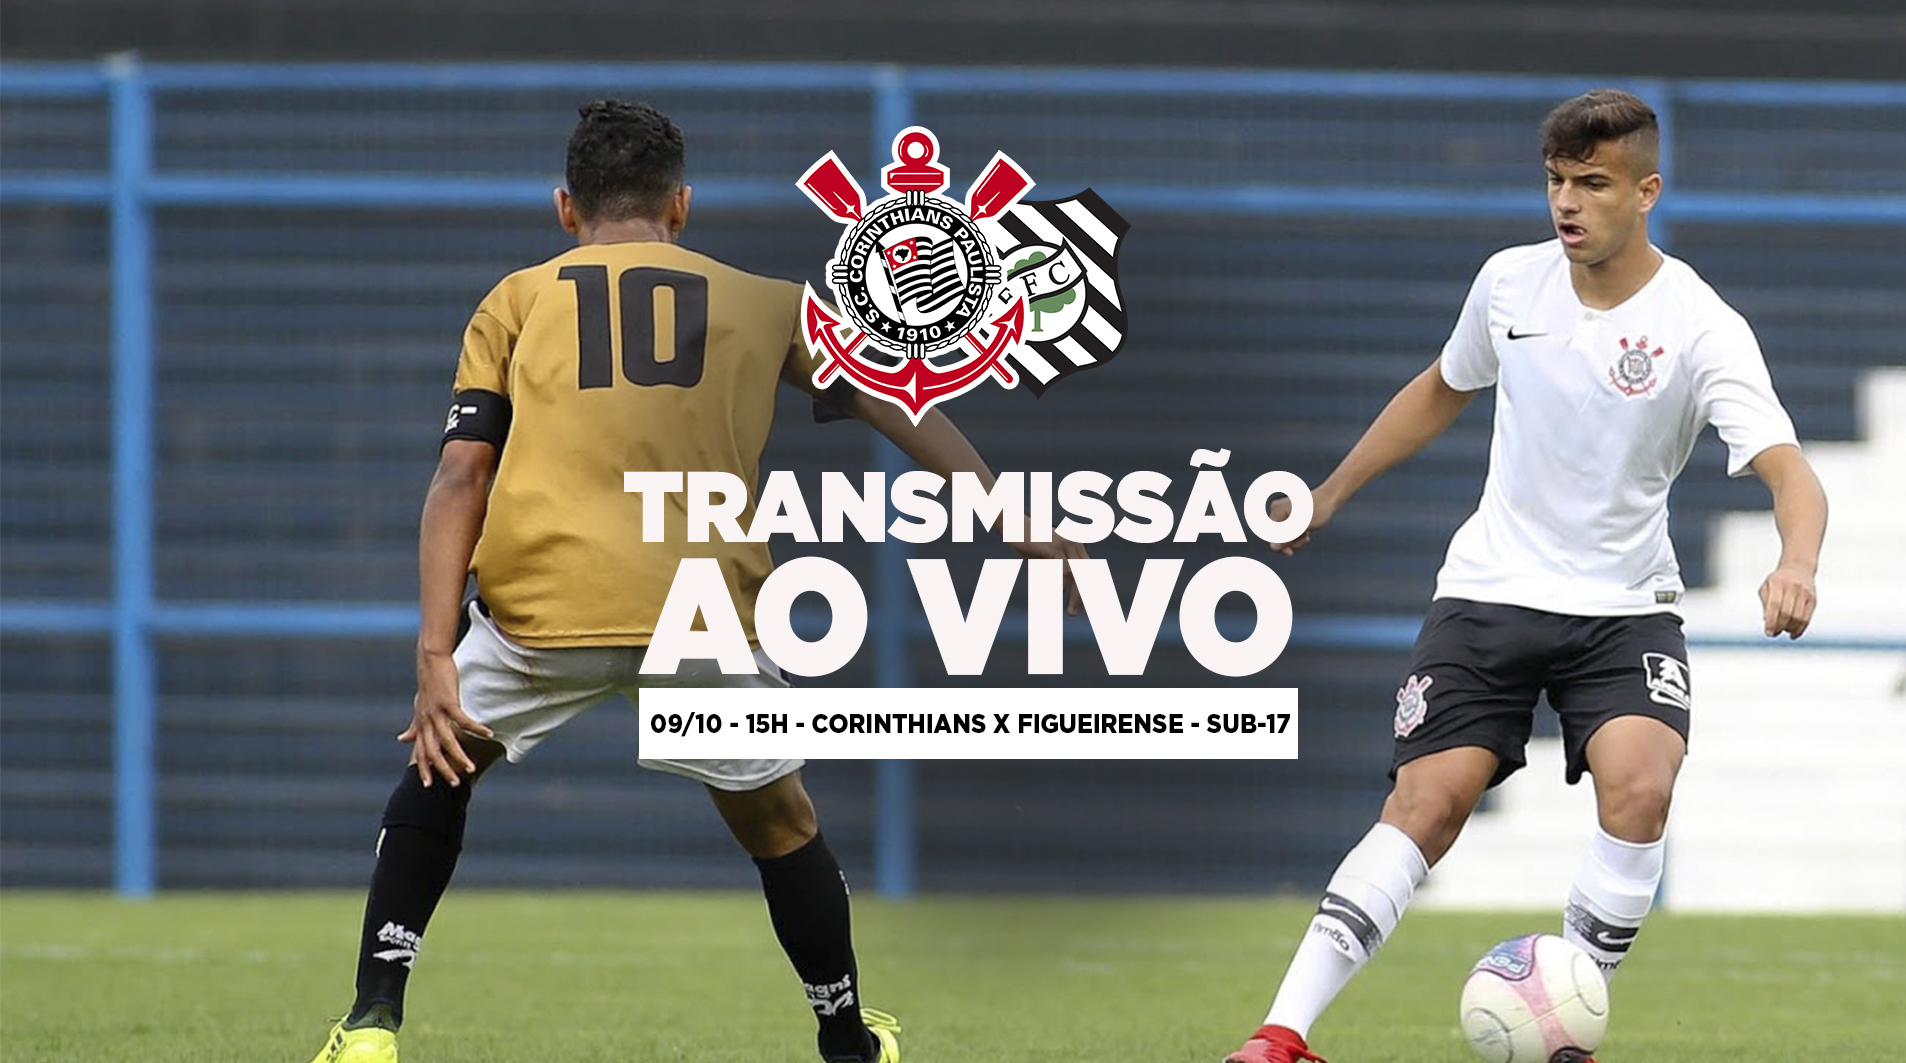 Corinthians x Figueirense - Copa do Brasil Sub-17